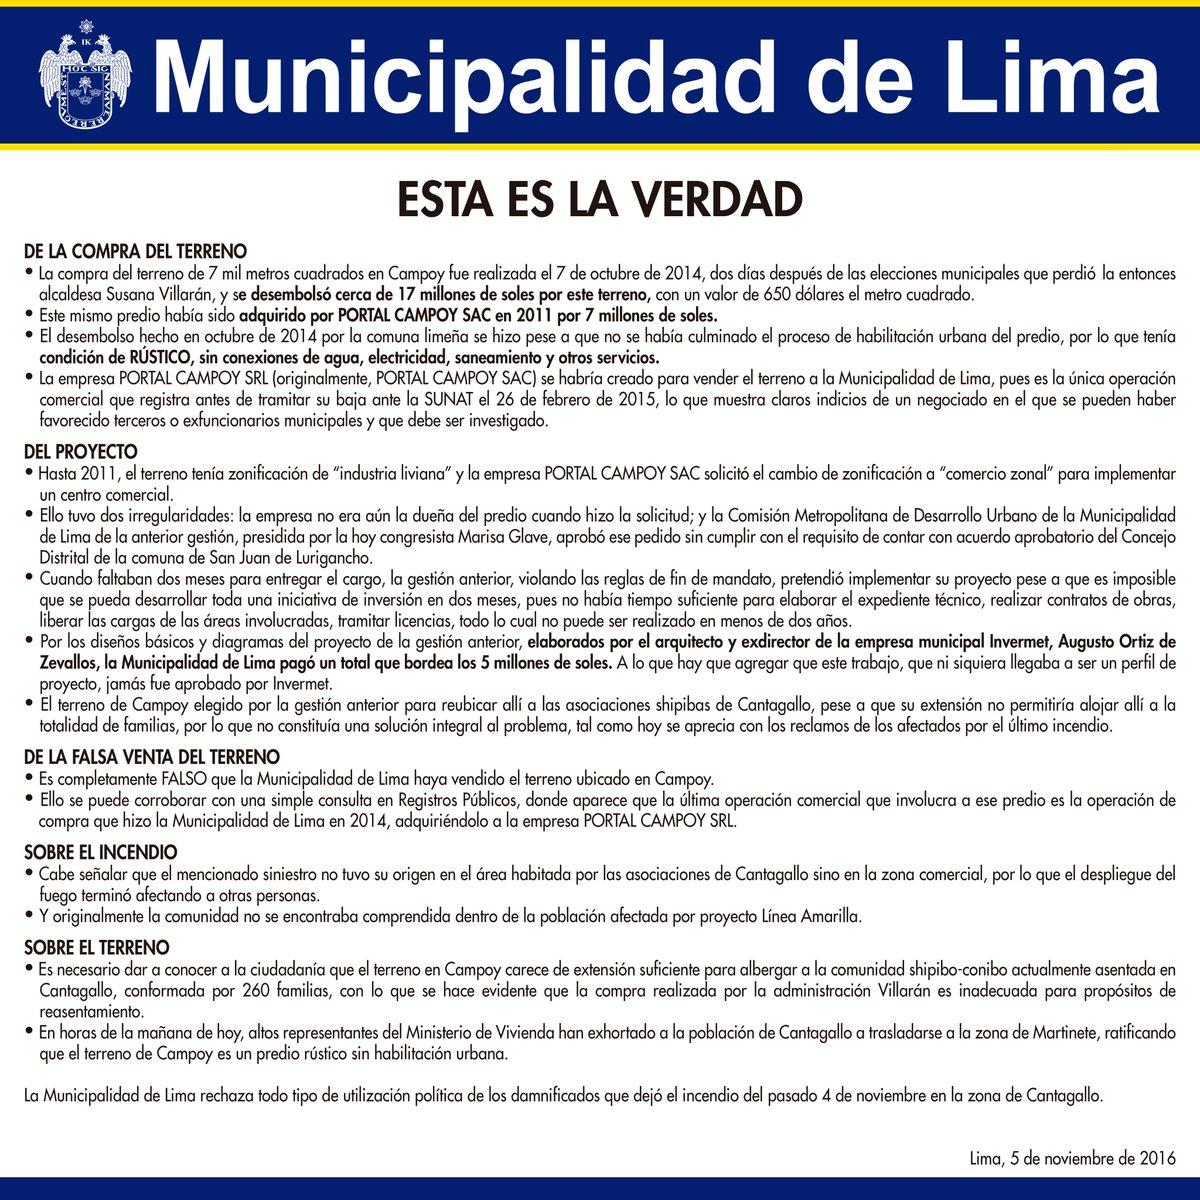 #Comunicado: Municipalidad de Lima se pronuncia sobre terreno de Campoy. #EstaEsLaVerdad ➝ https://t.co/GzzBJn8G8G https://t.co/yRxWs2ZG14